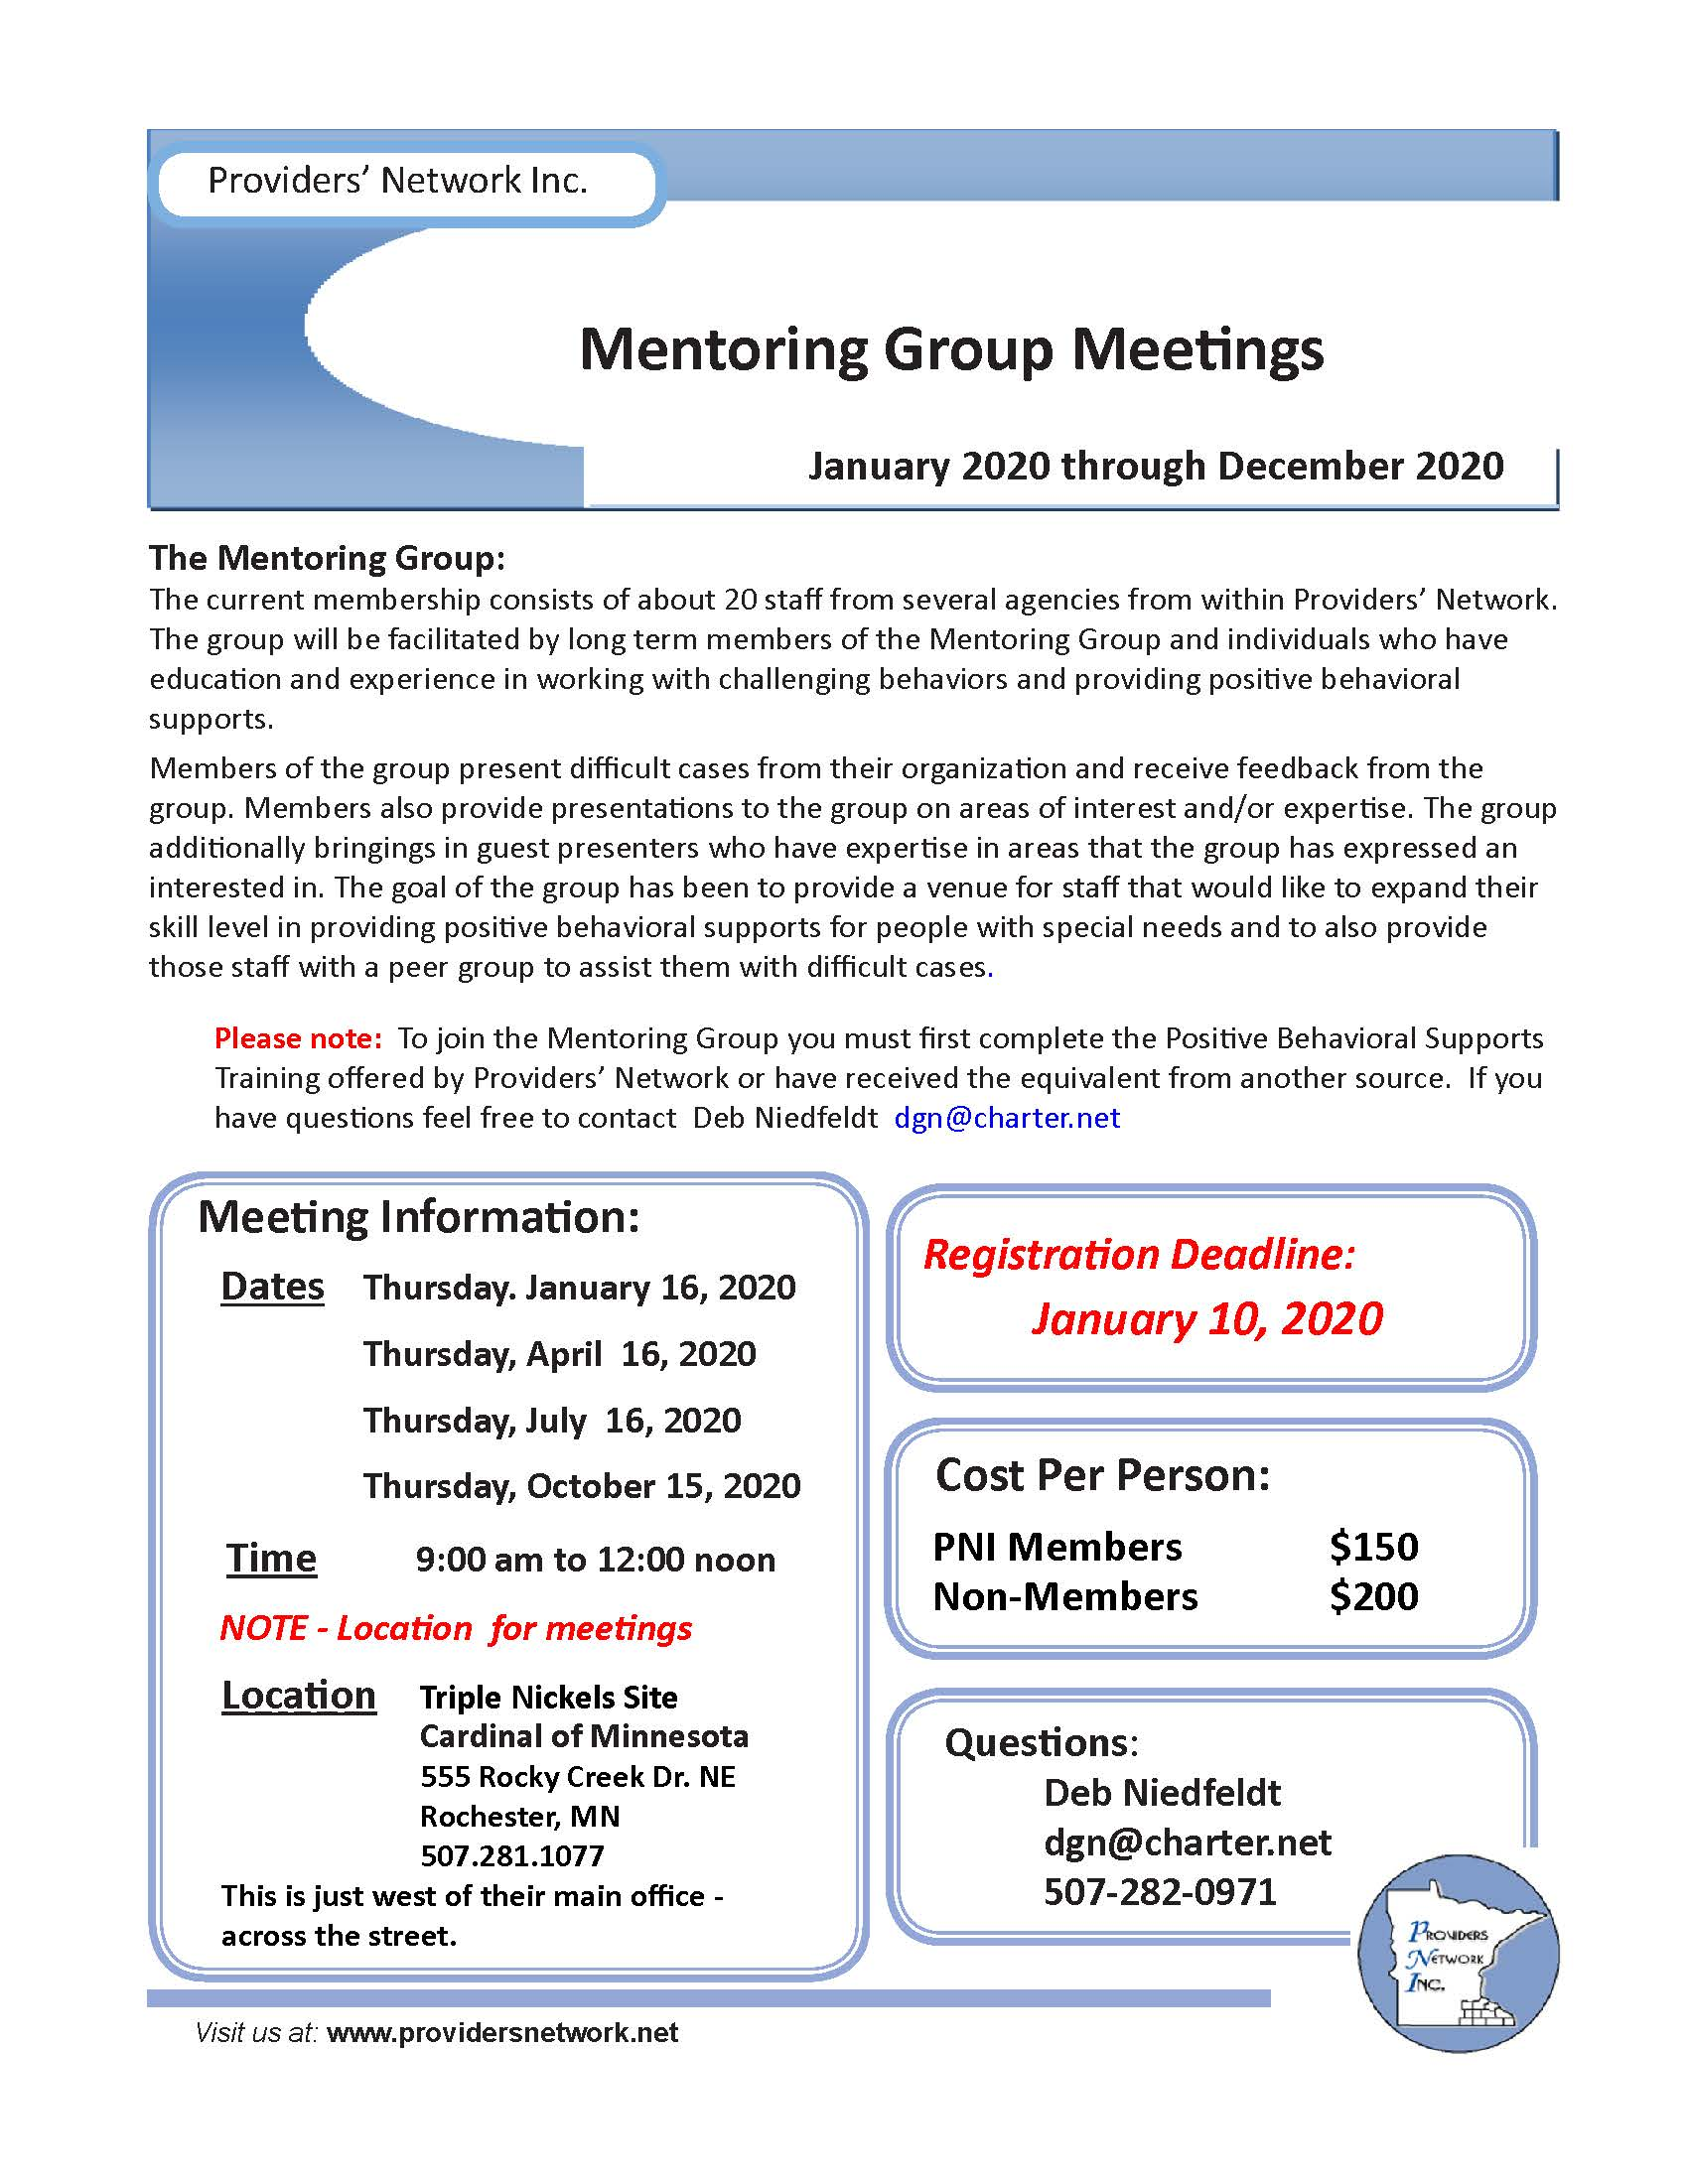 Mentoring Group @ Cardinal, Rochester